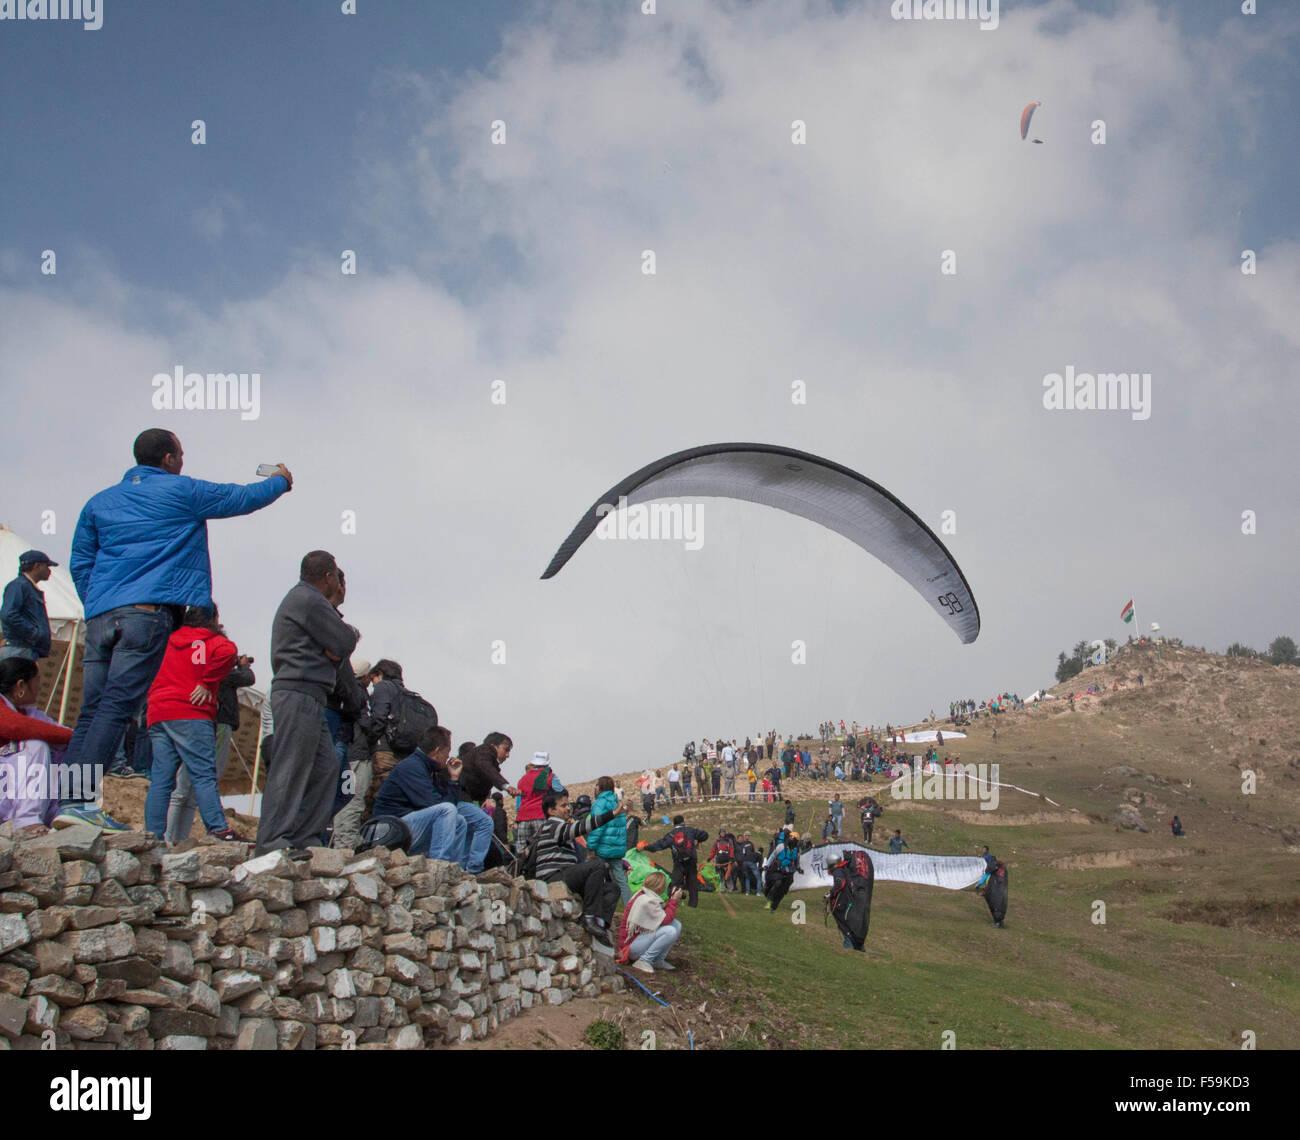 Dharamshala Distt. Kangra, India. 30th Oct, 2015. Paraglider pilots during the AAI Paragliding World Cup 2015 at - Stock Image